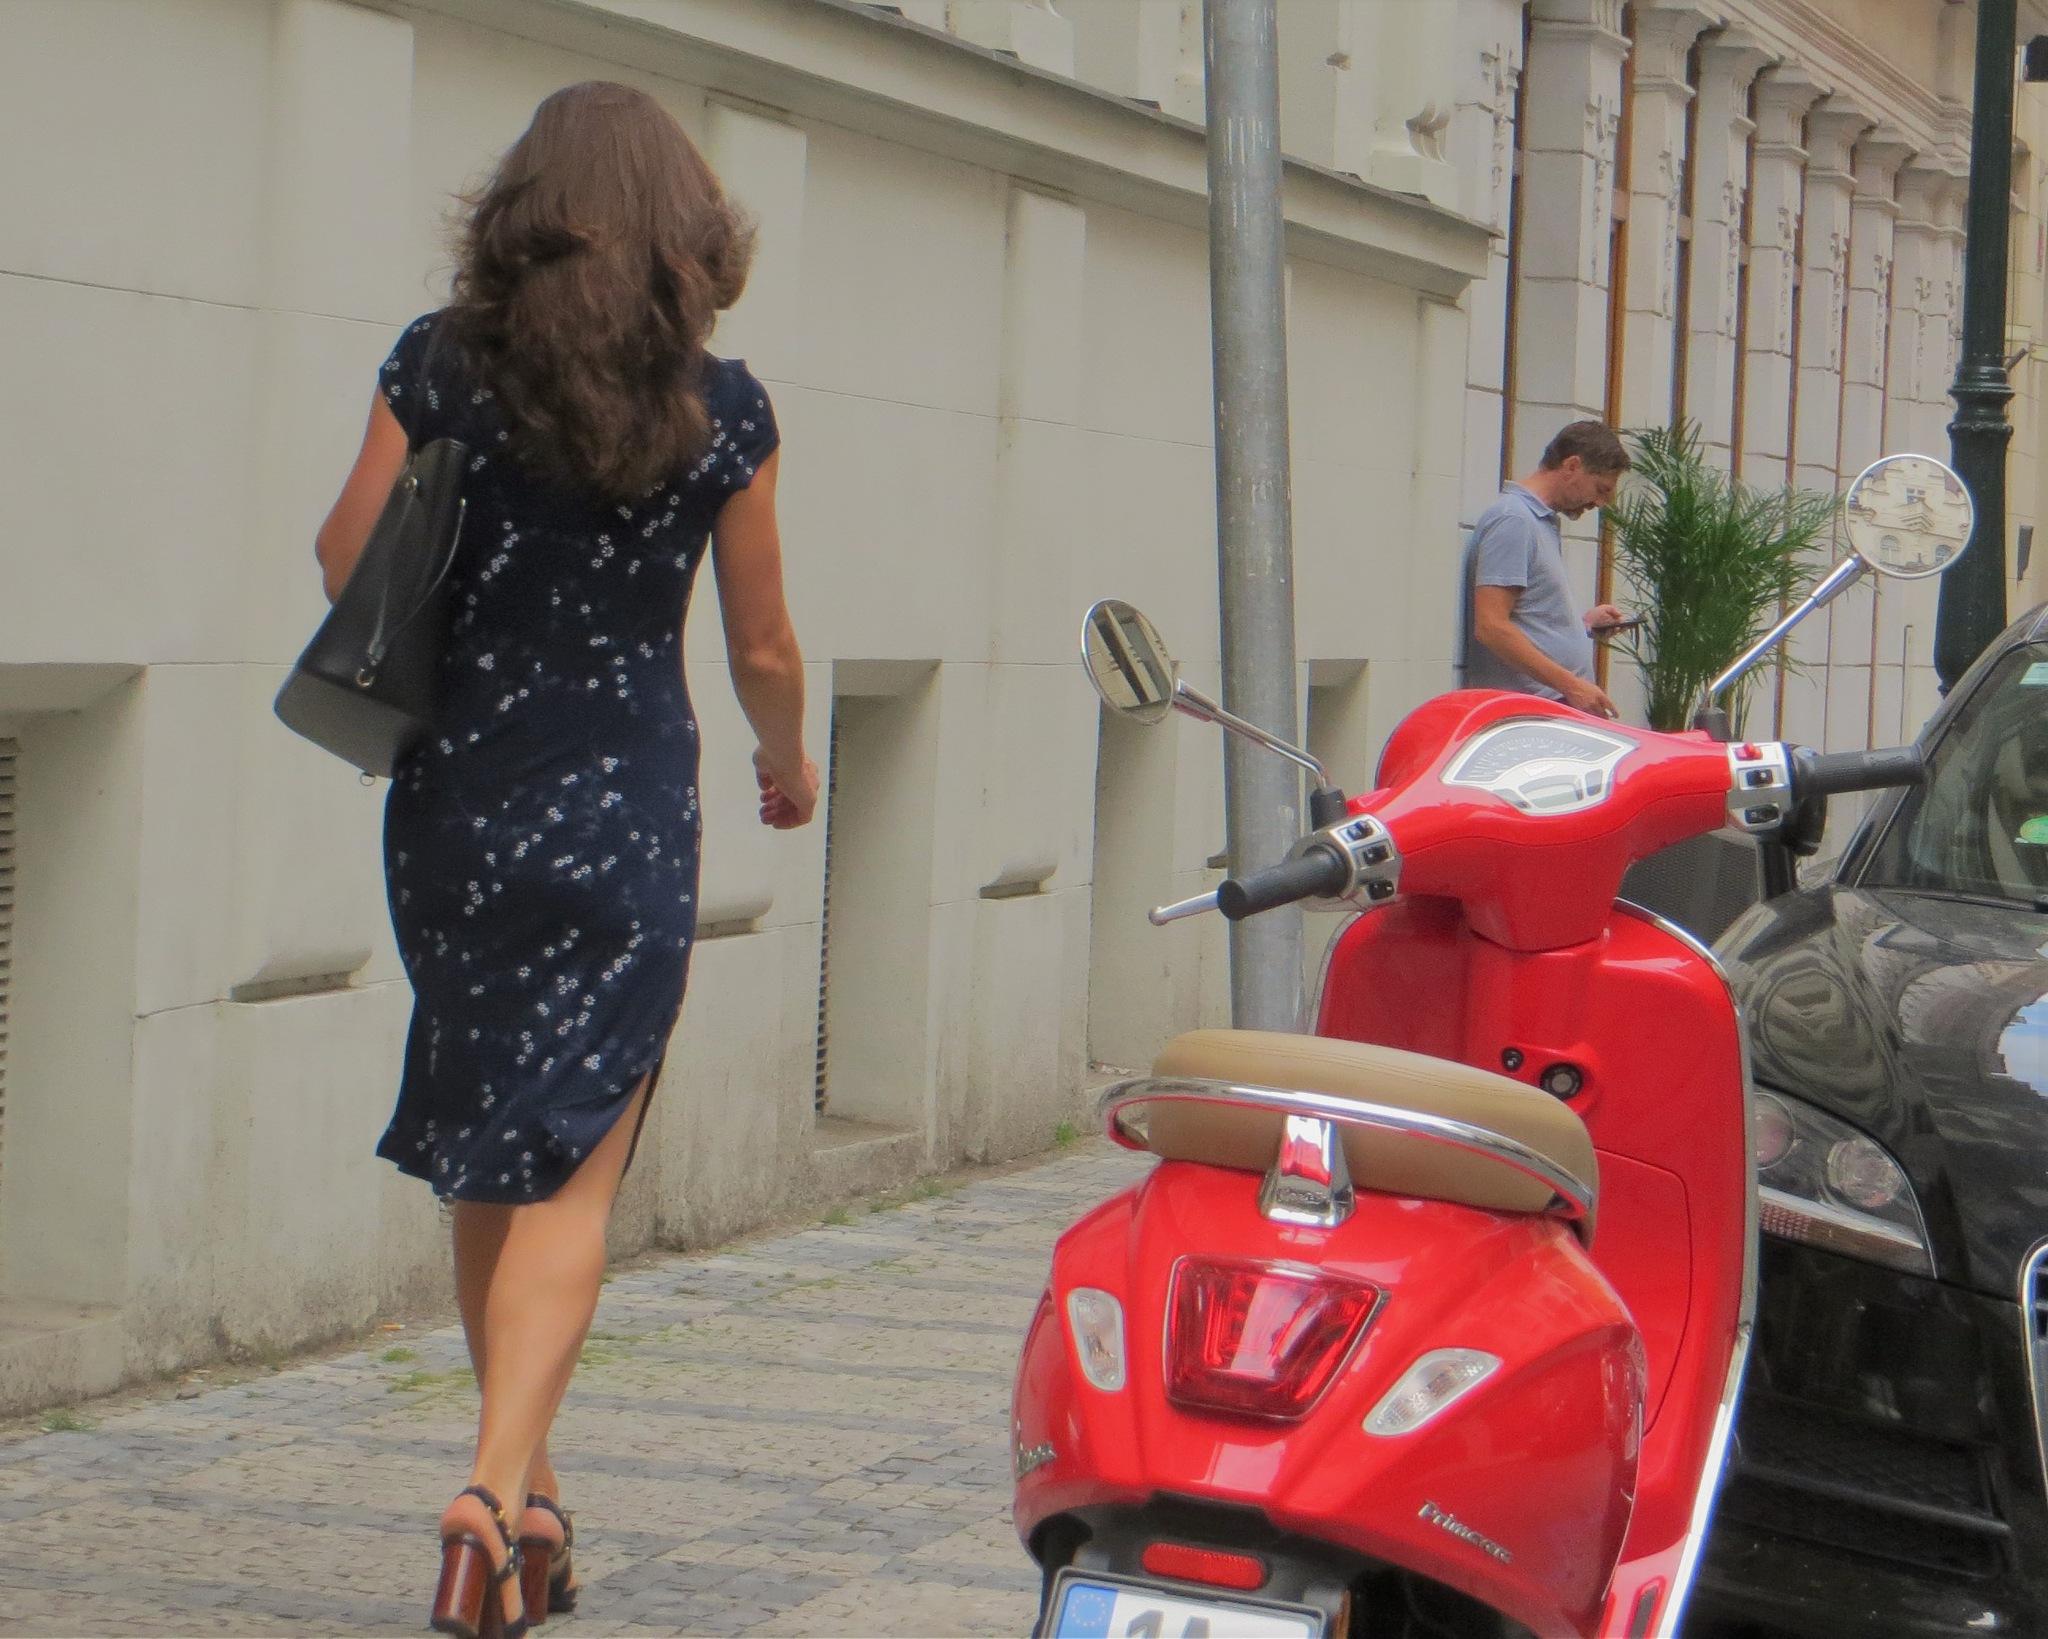 Pretty Woman Walking Down The Street by Barbara Stockford